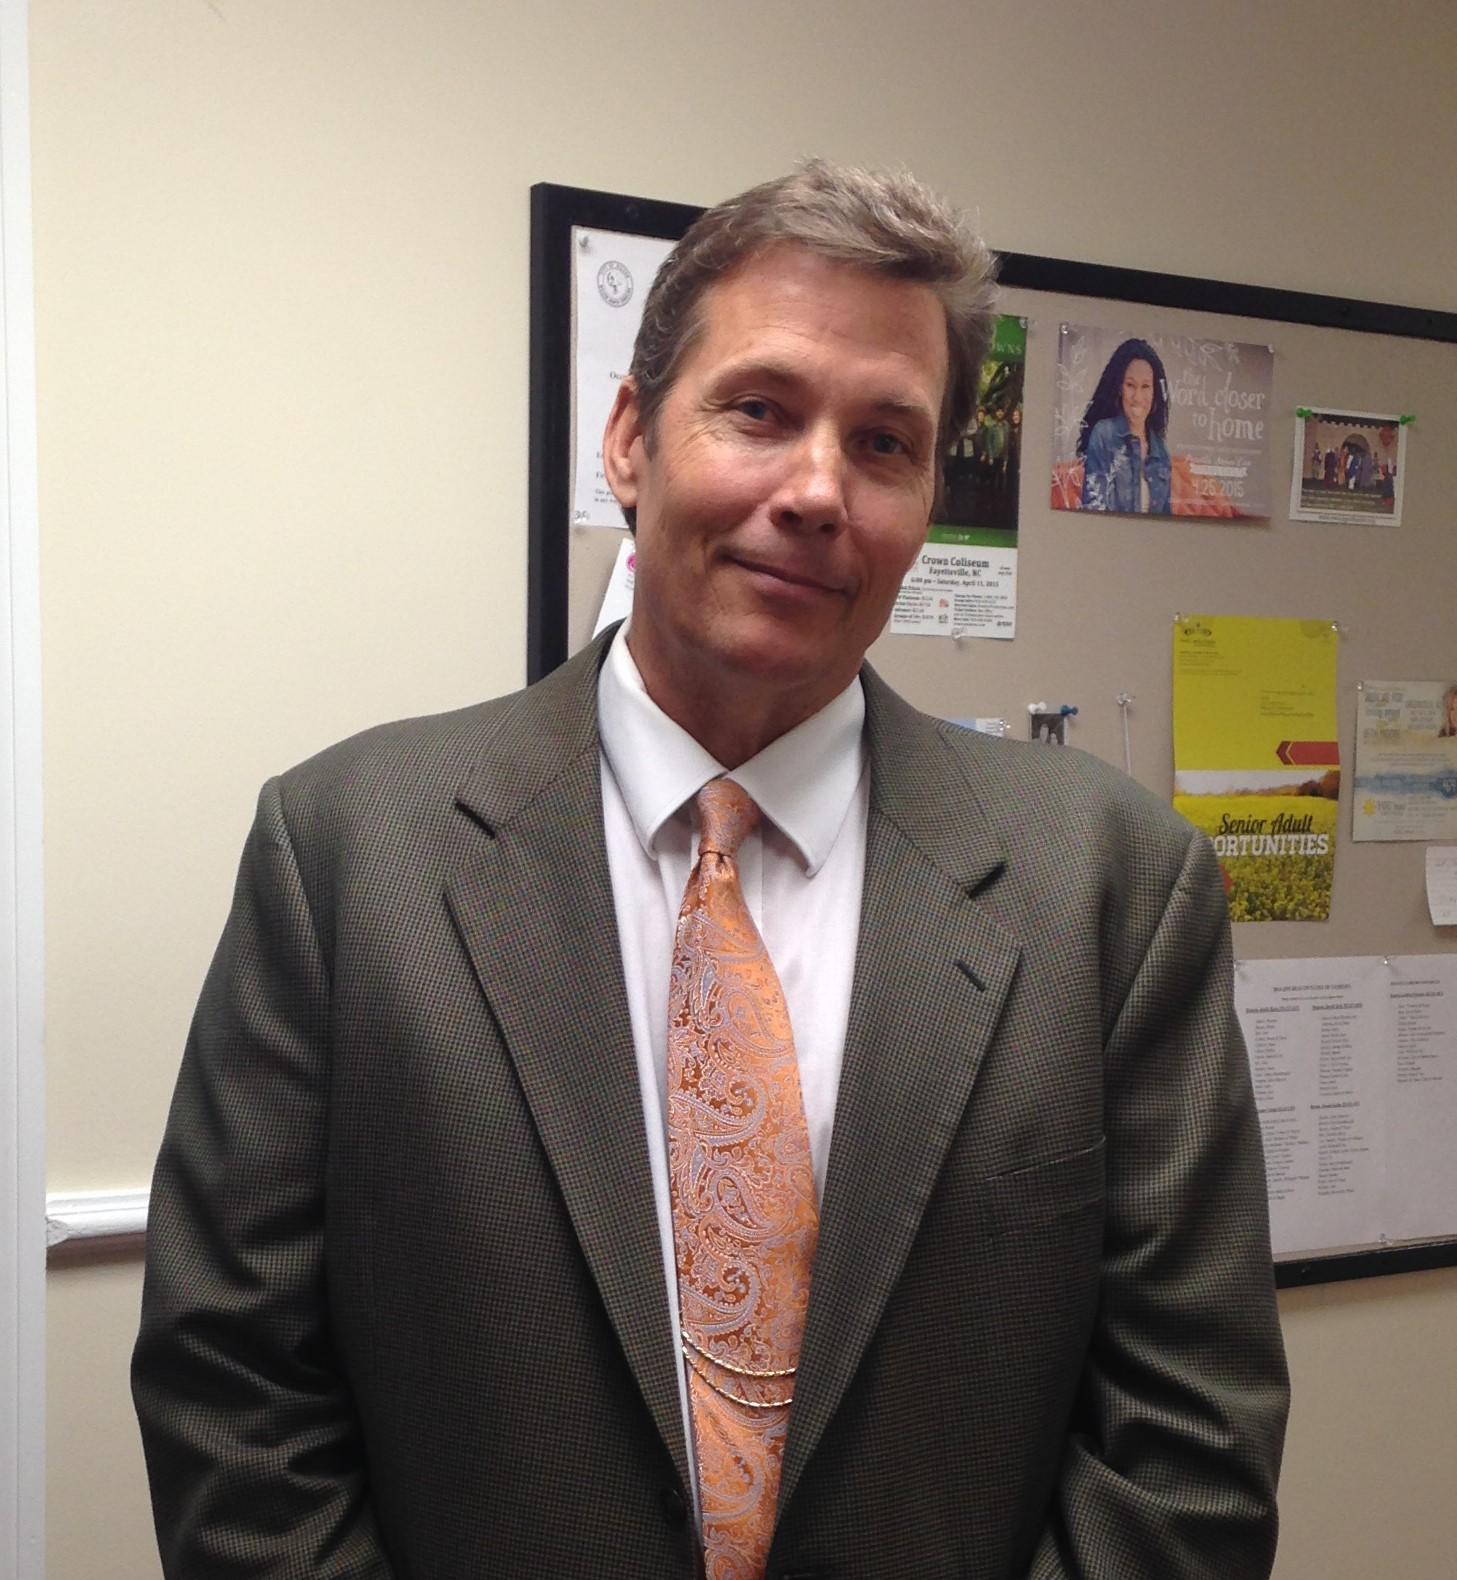 Pastor Steve Strickland